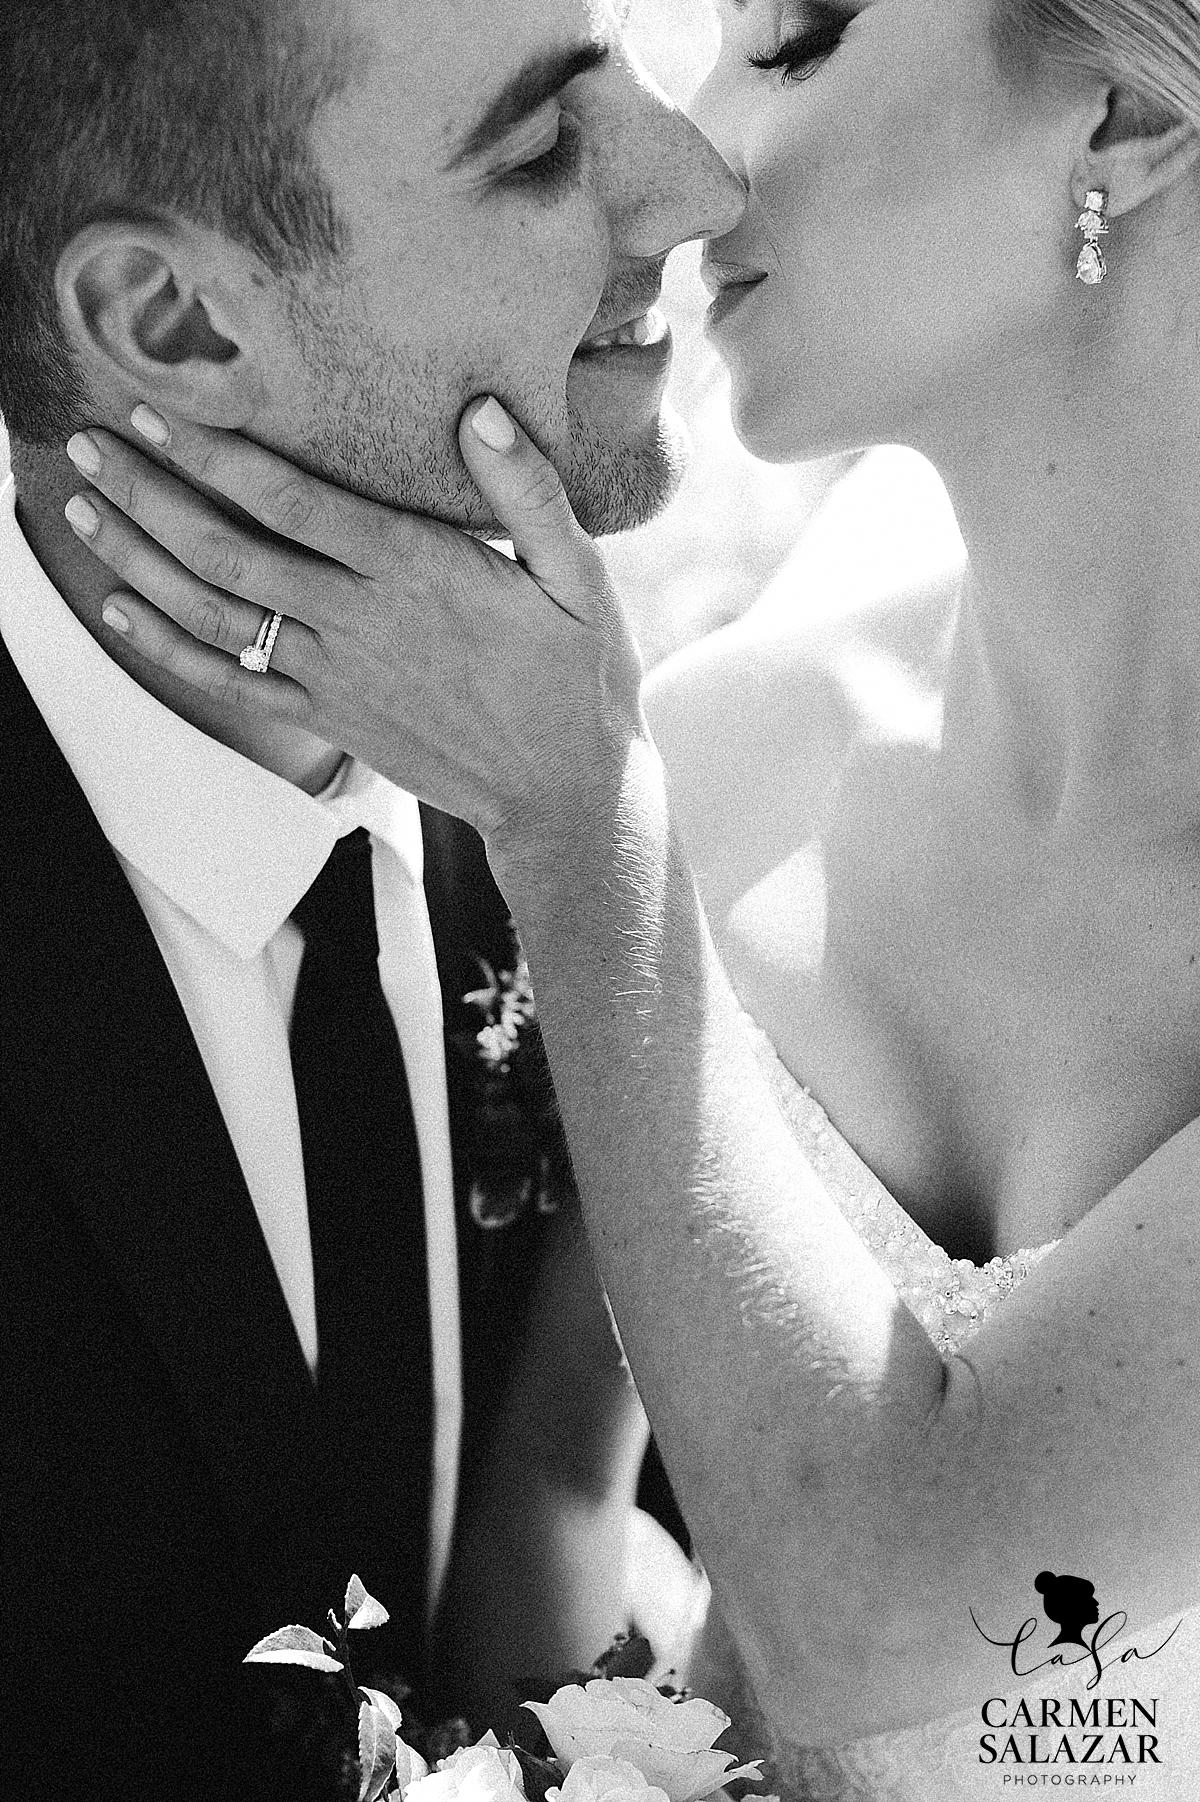 Intimate newlywed portrait photographer - Carmen Salazar